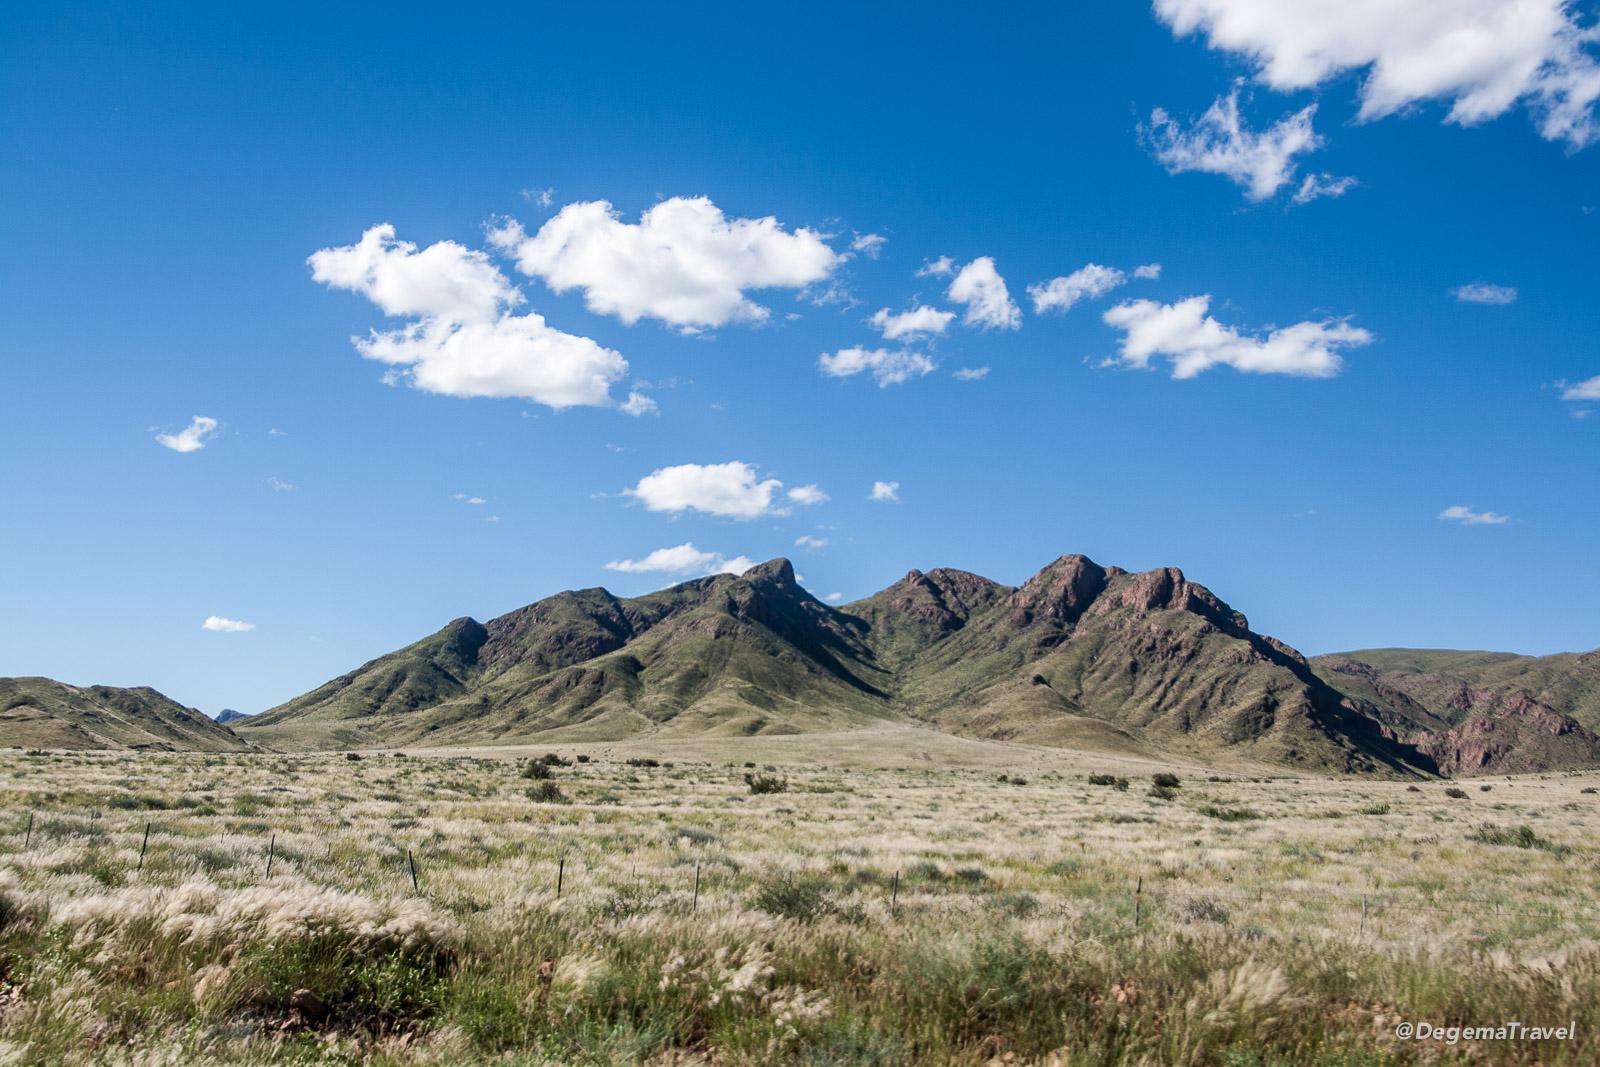 The beautiful scenery of Namibia